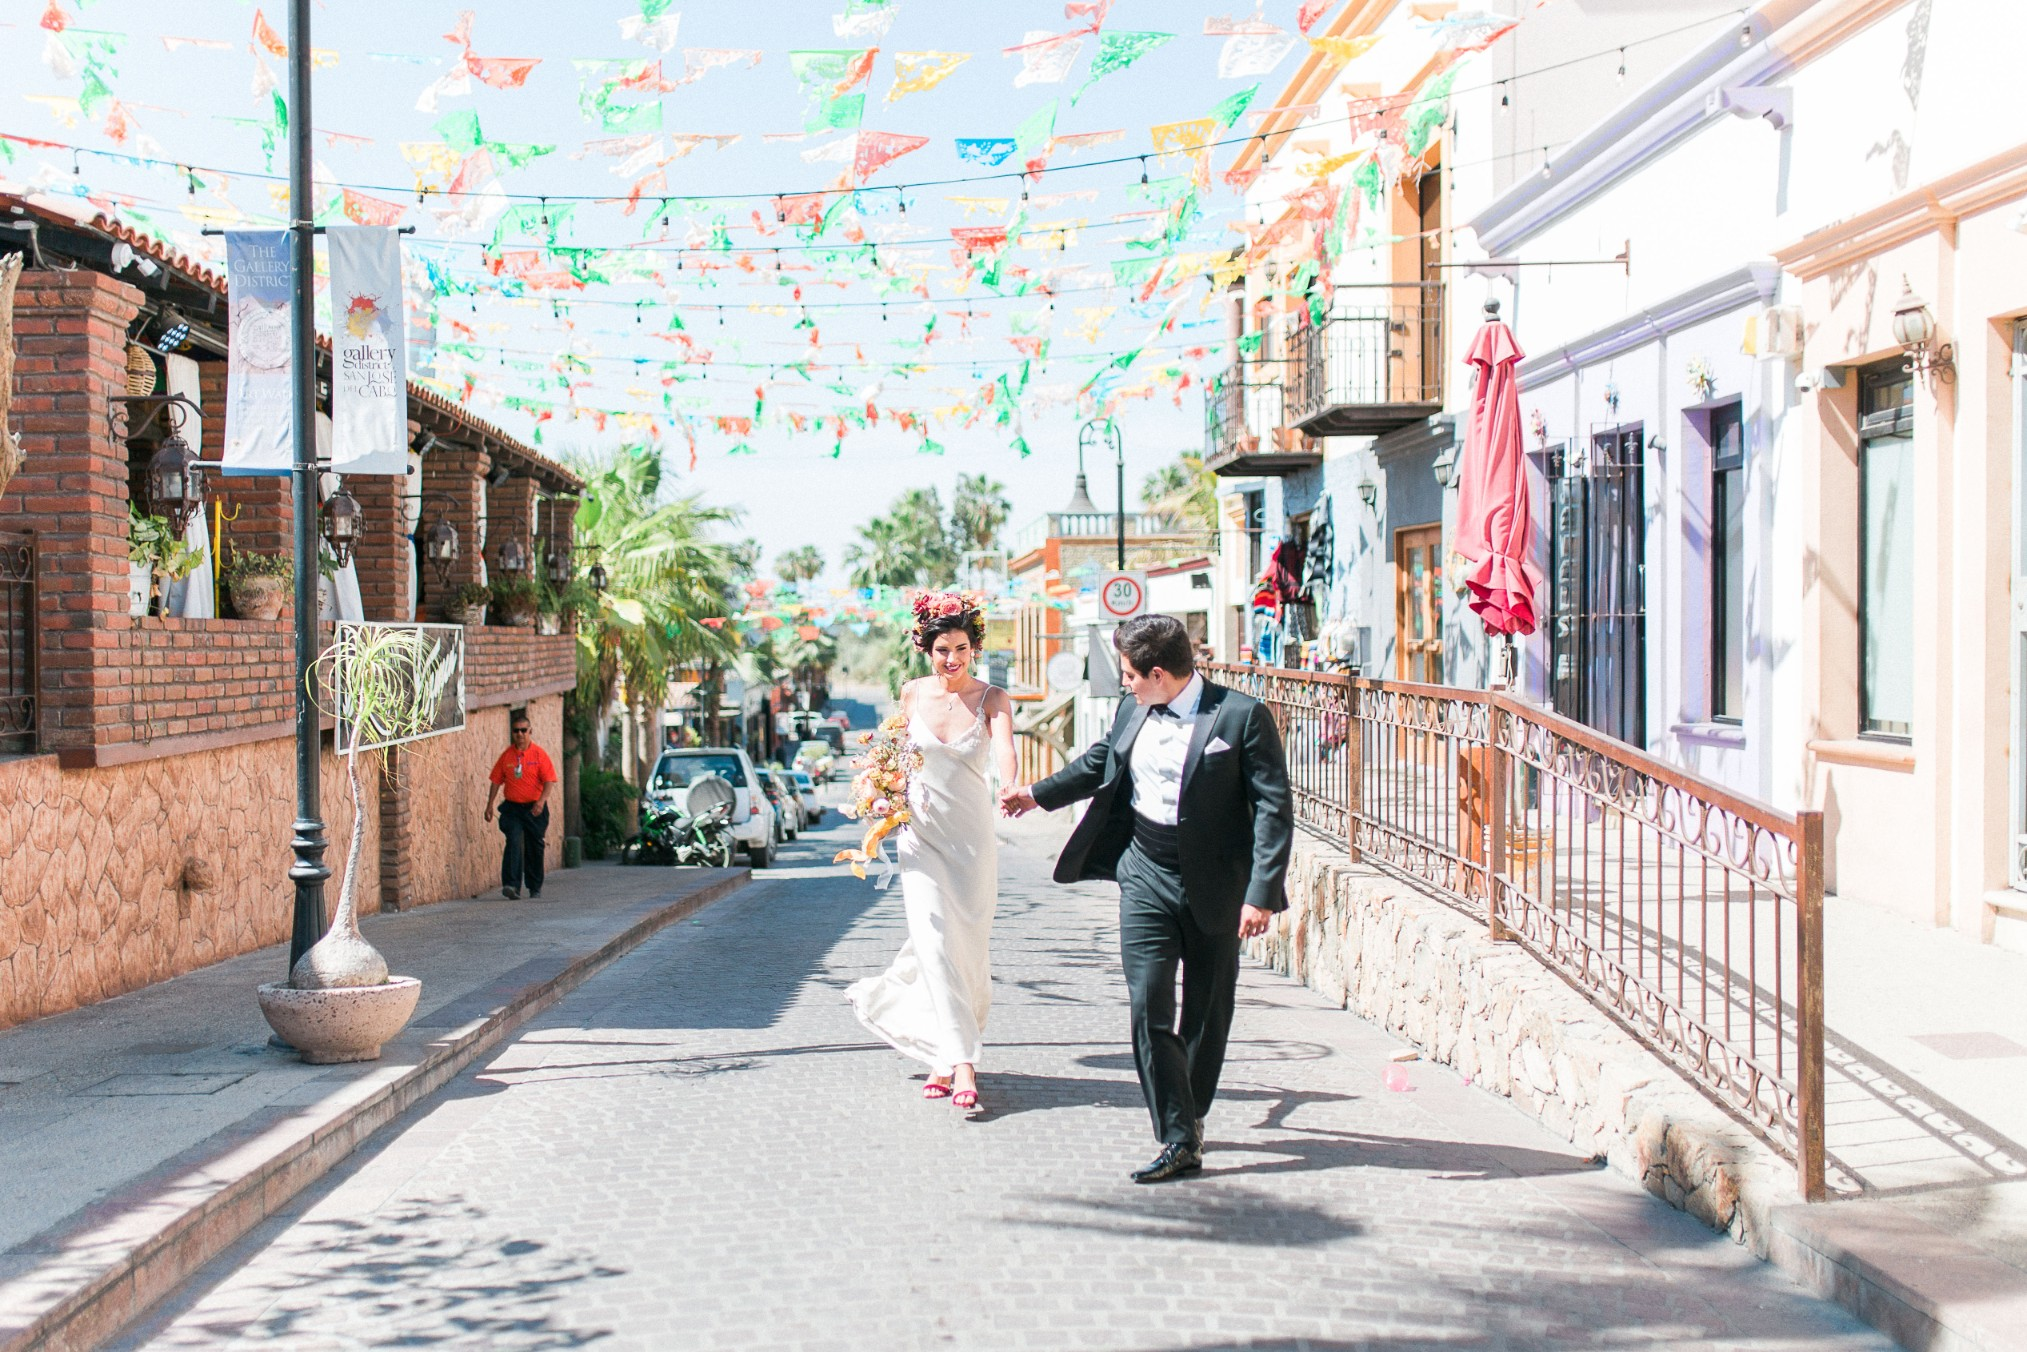 Los Cabos Wedding Photographer - Destination Wedding - Chileno Bay Resort Wedding Photos (8).jpg